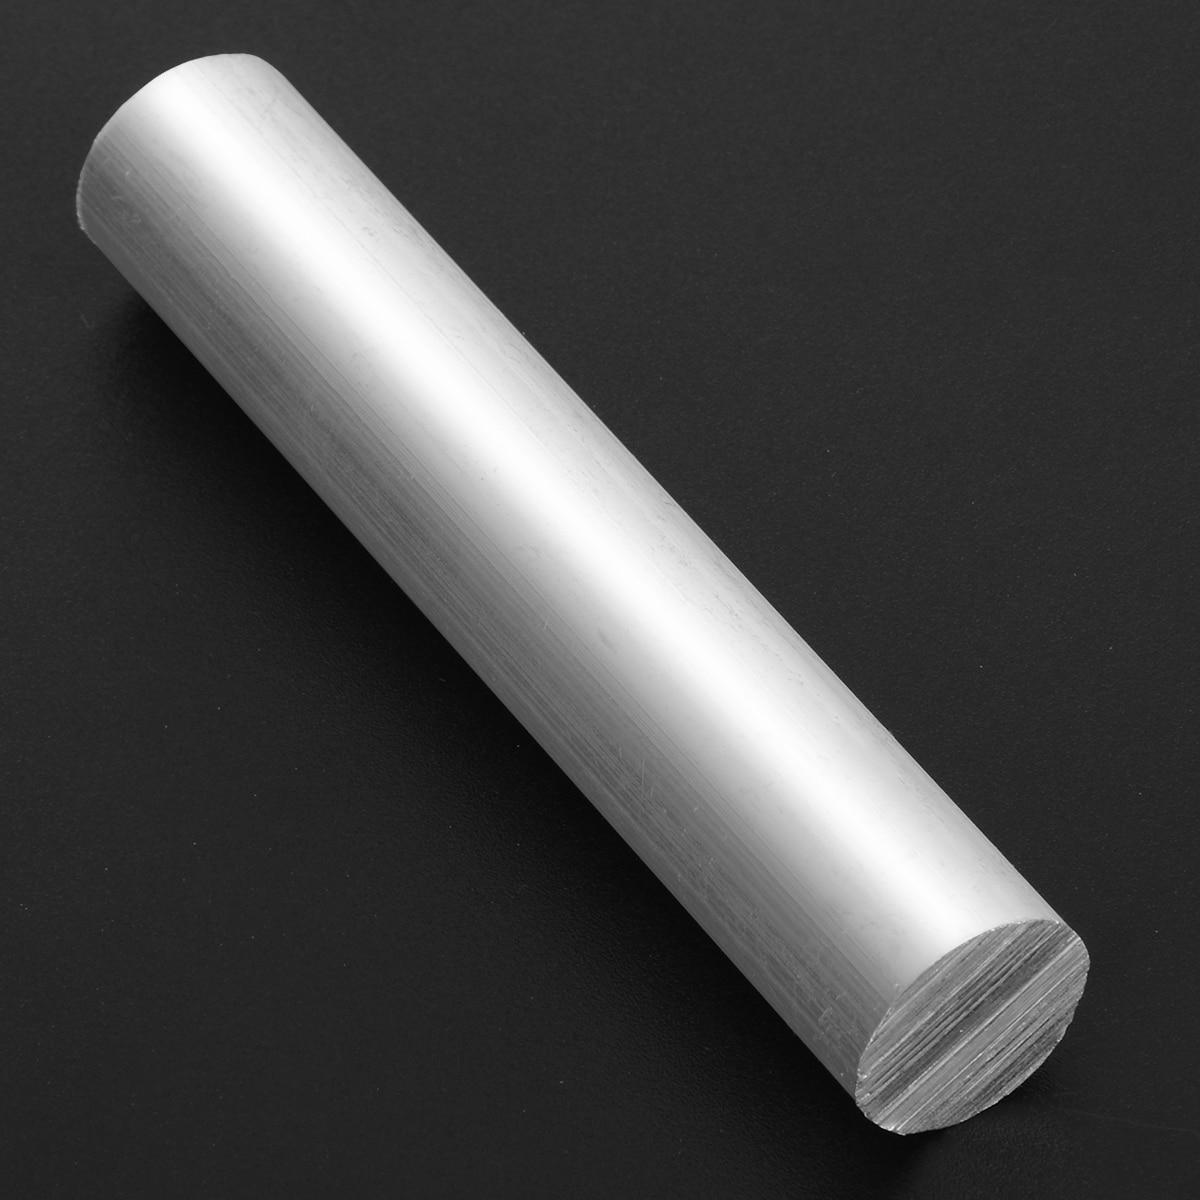 1pc Purity 99.99% Mg Magnesium Metal Rod 16mm X 9cm High Purity Metal Welding Soldering Mg Rod Bar